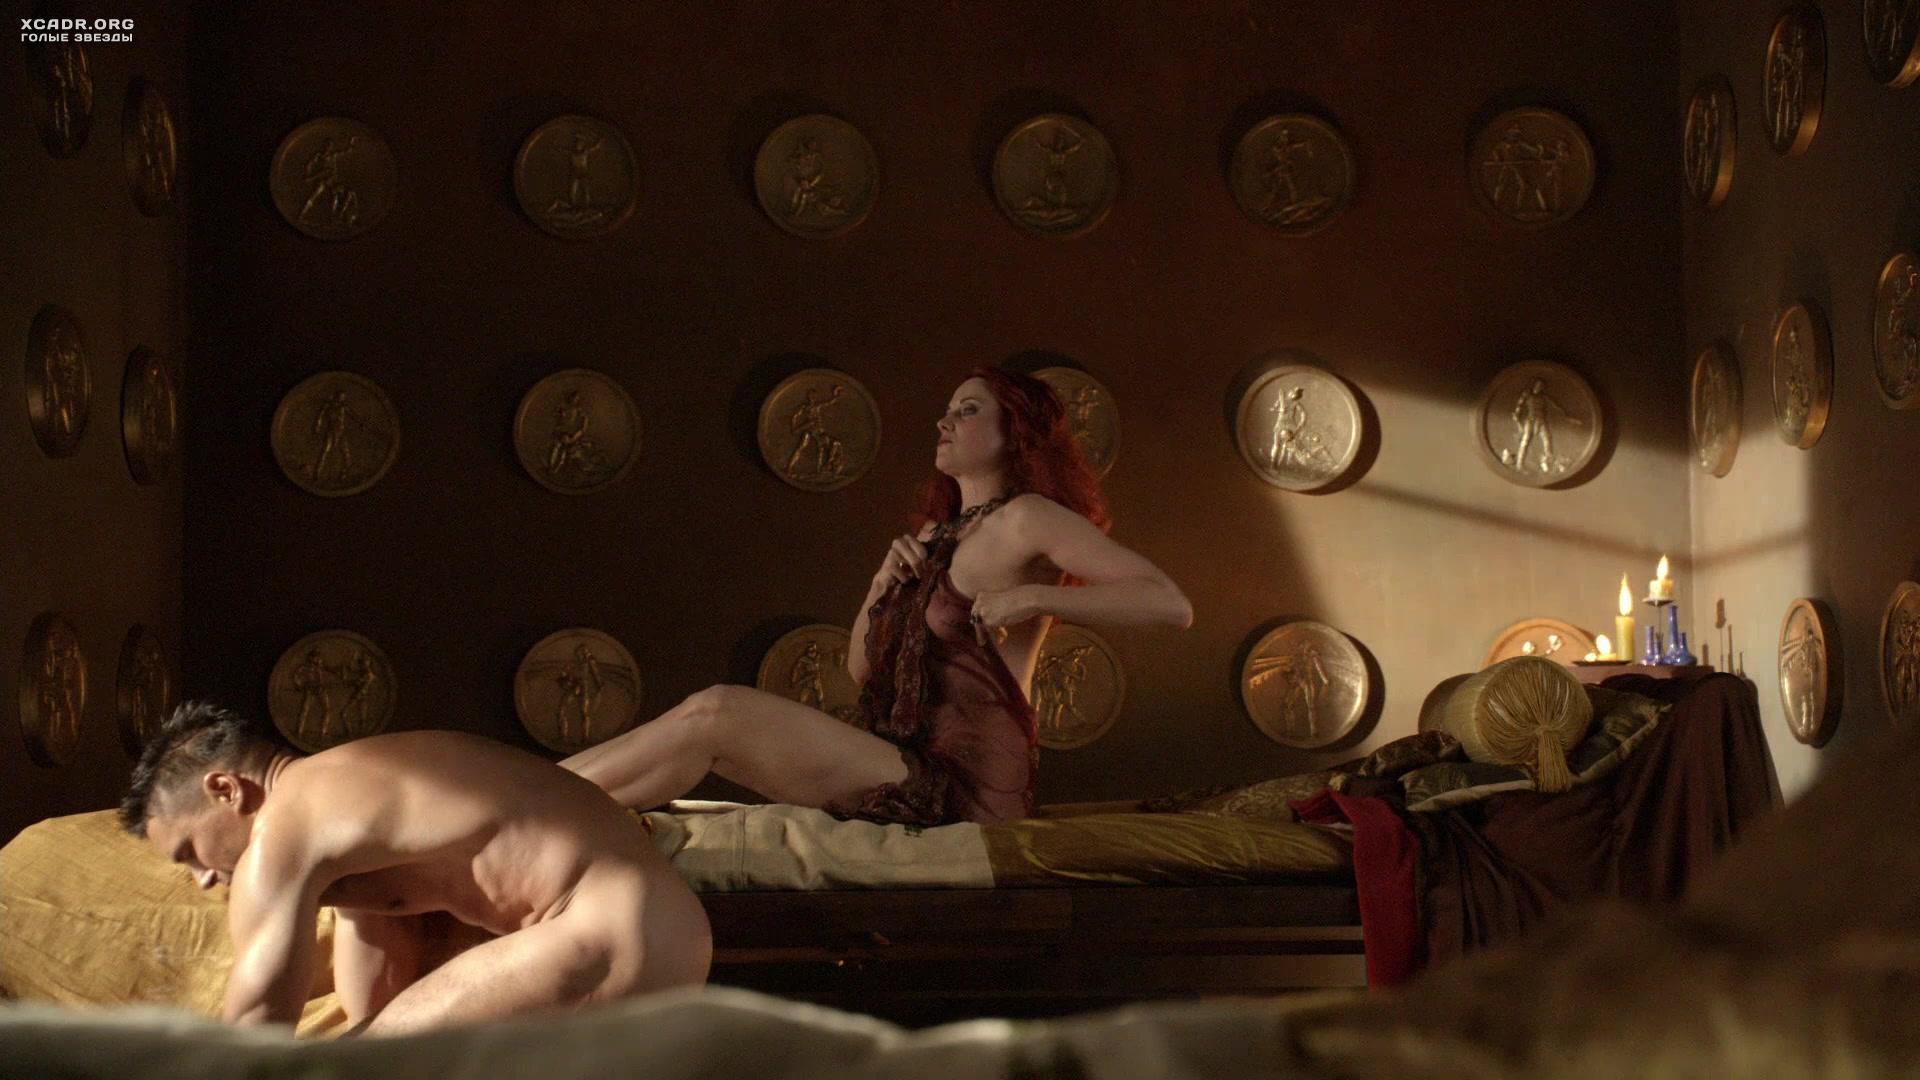 eroticheskie-foto-i-oboi-aktrisi-danilovoy-galini